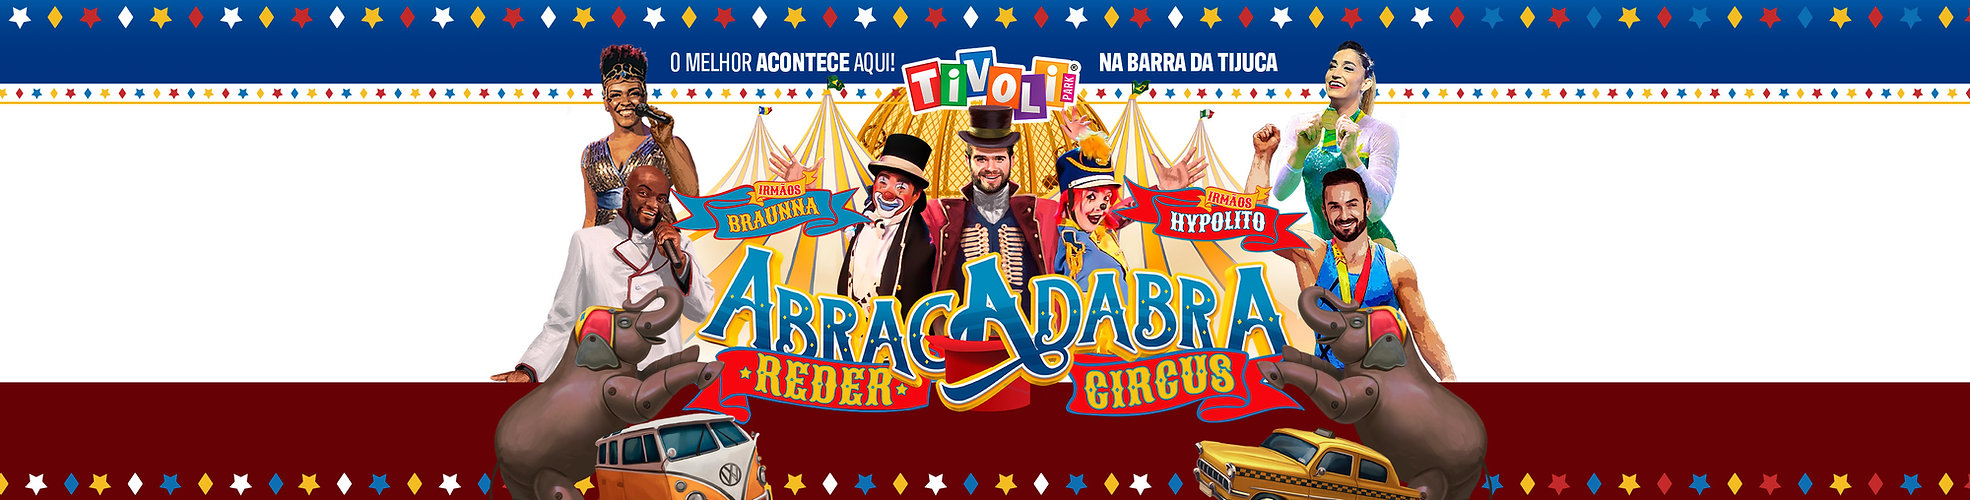 Banner site - Reder Circus (1).jpg